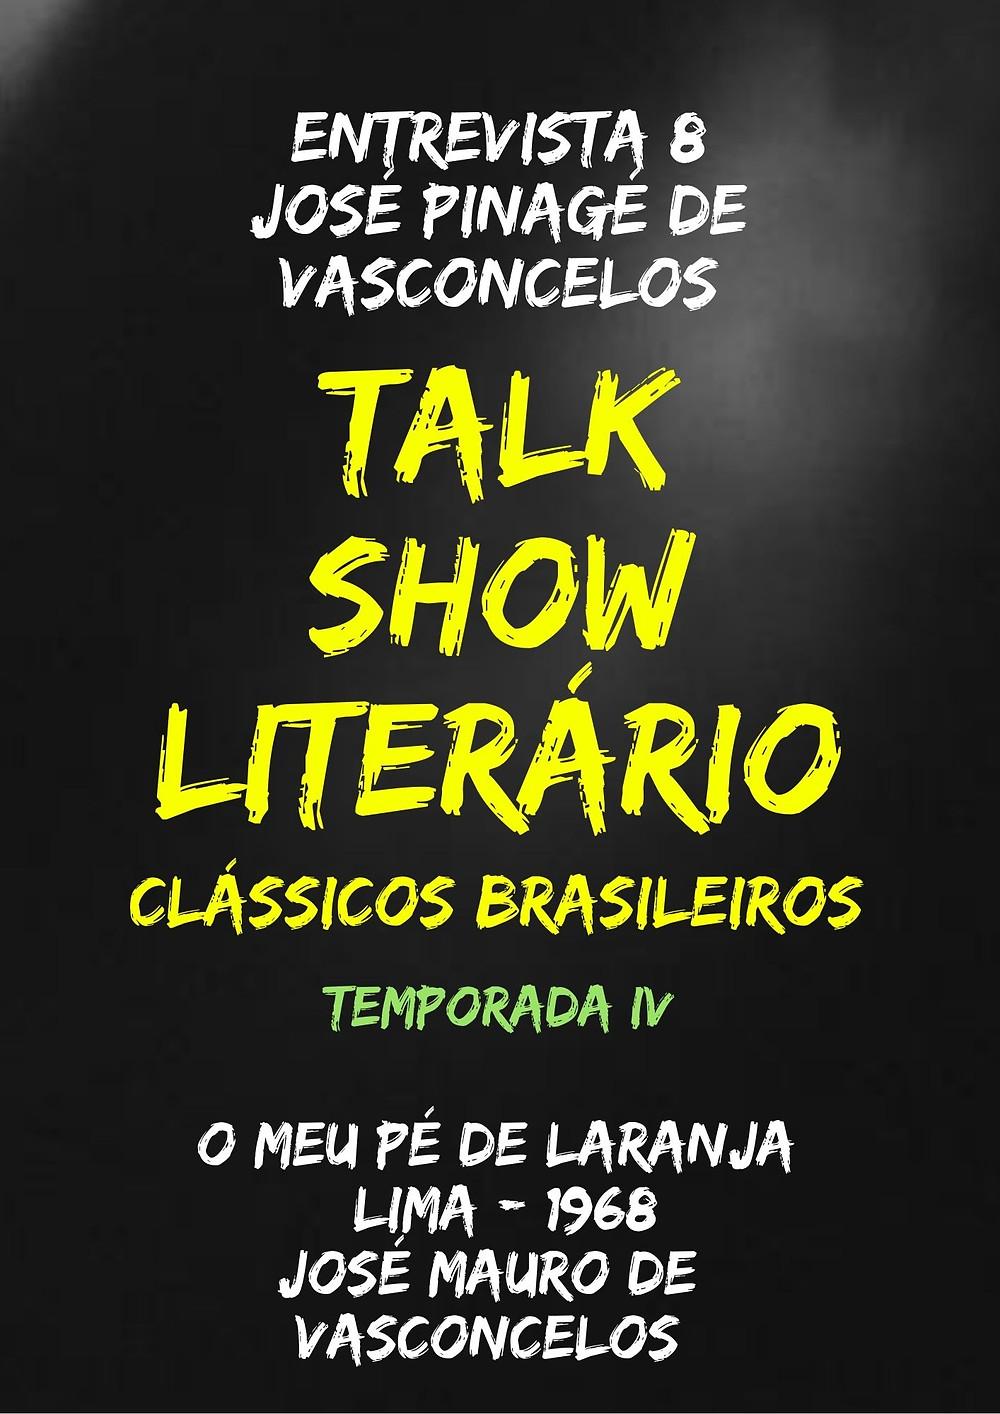 Talk Show Literário Zezé